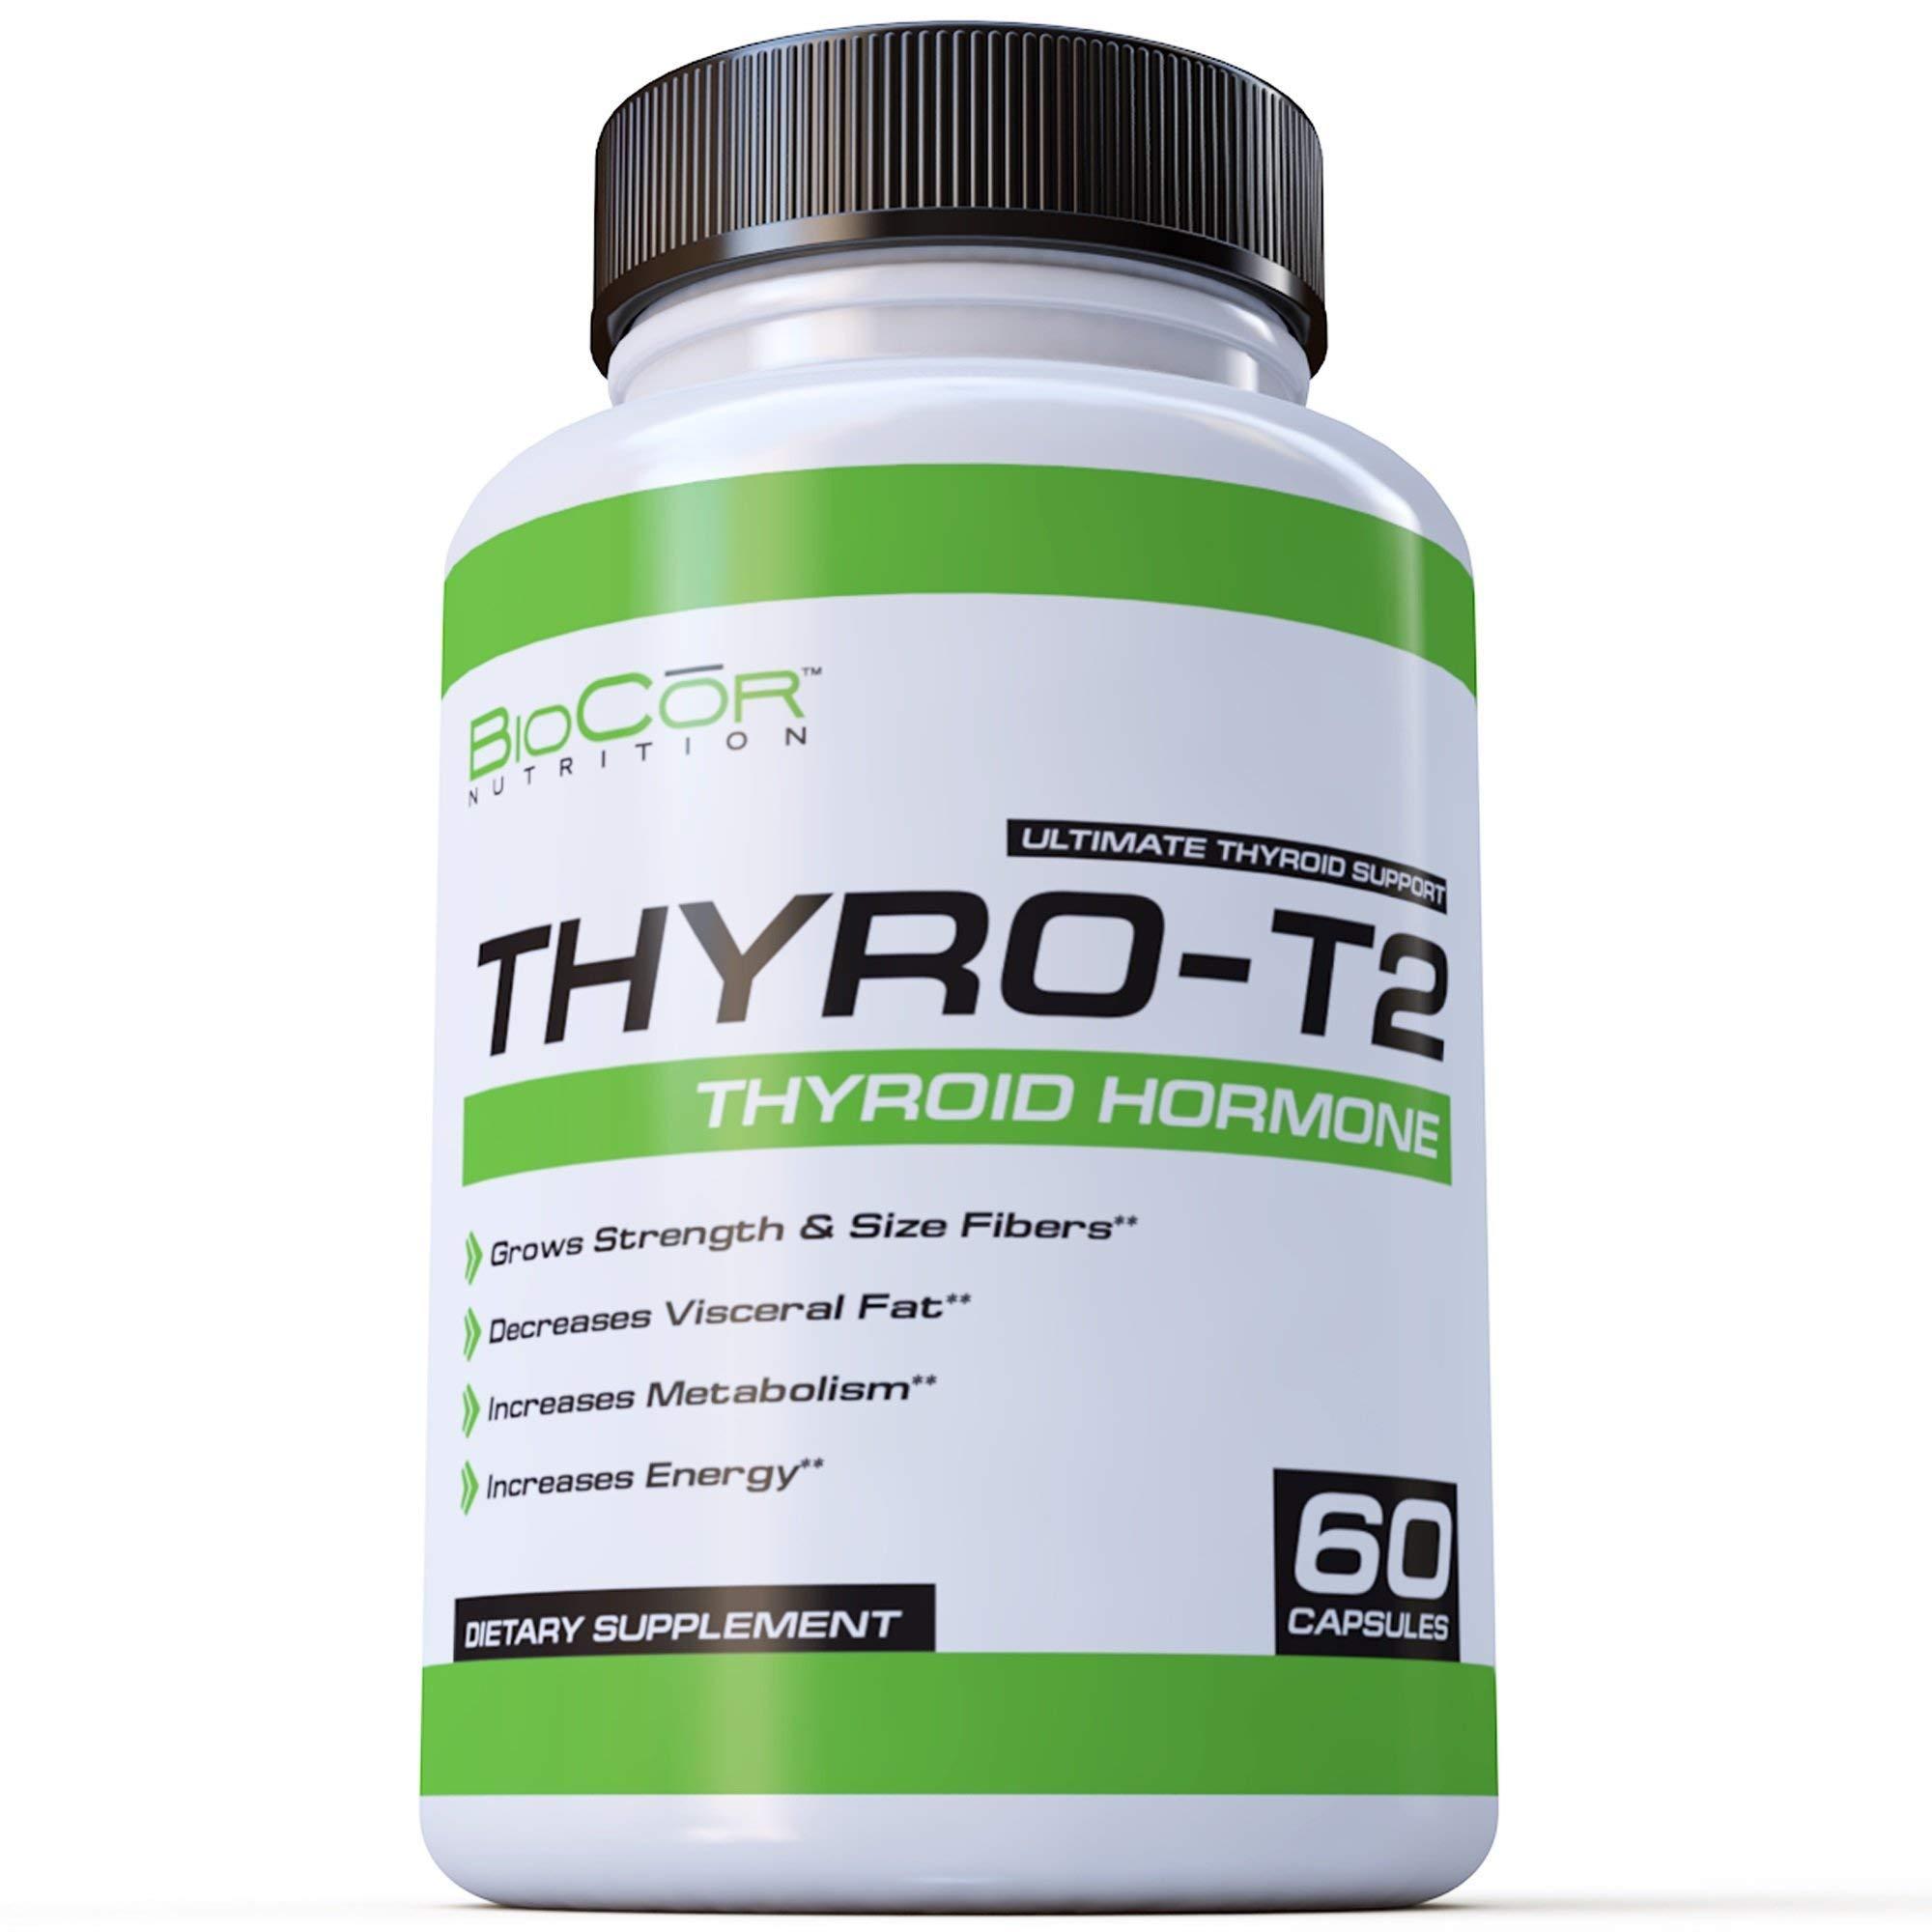 Lifeseasons, Thyro-T: Thyroid Support, 60 Count by Life Seasons